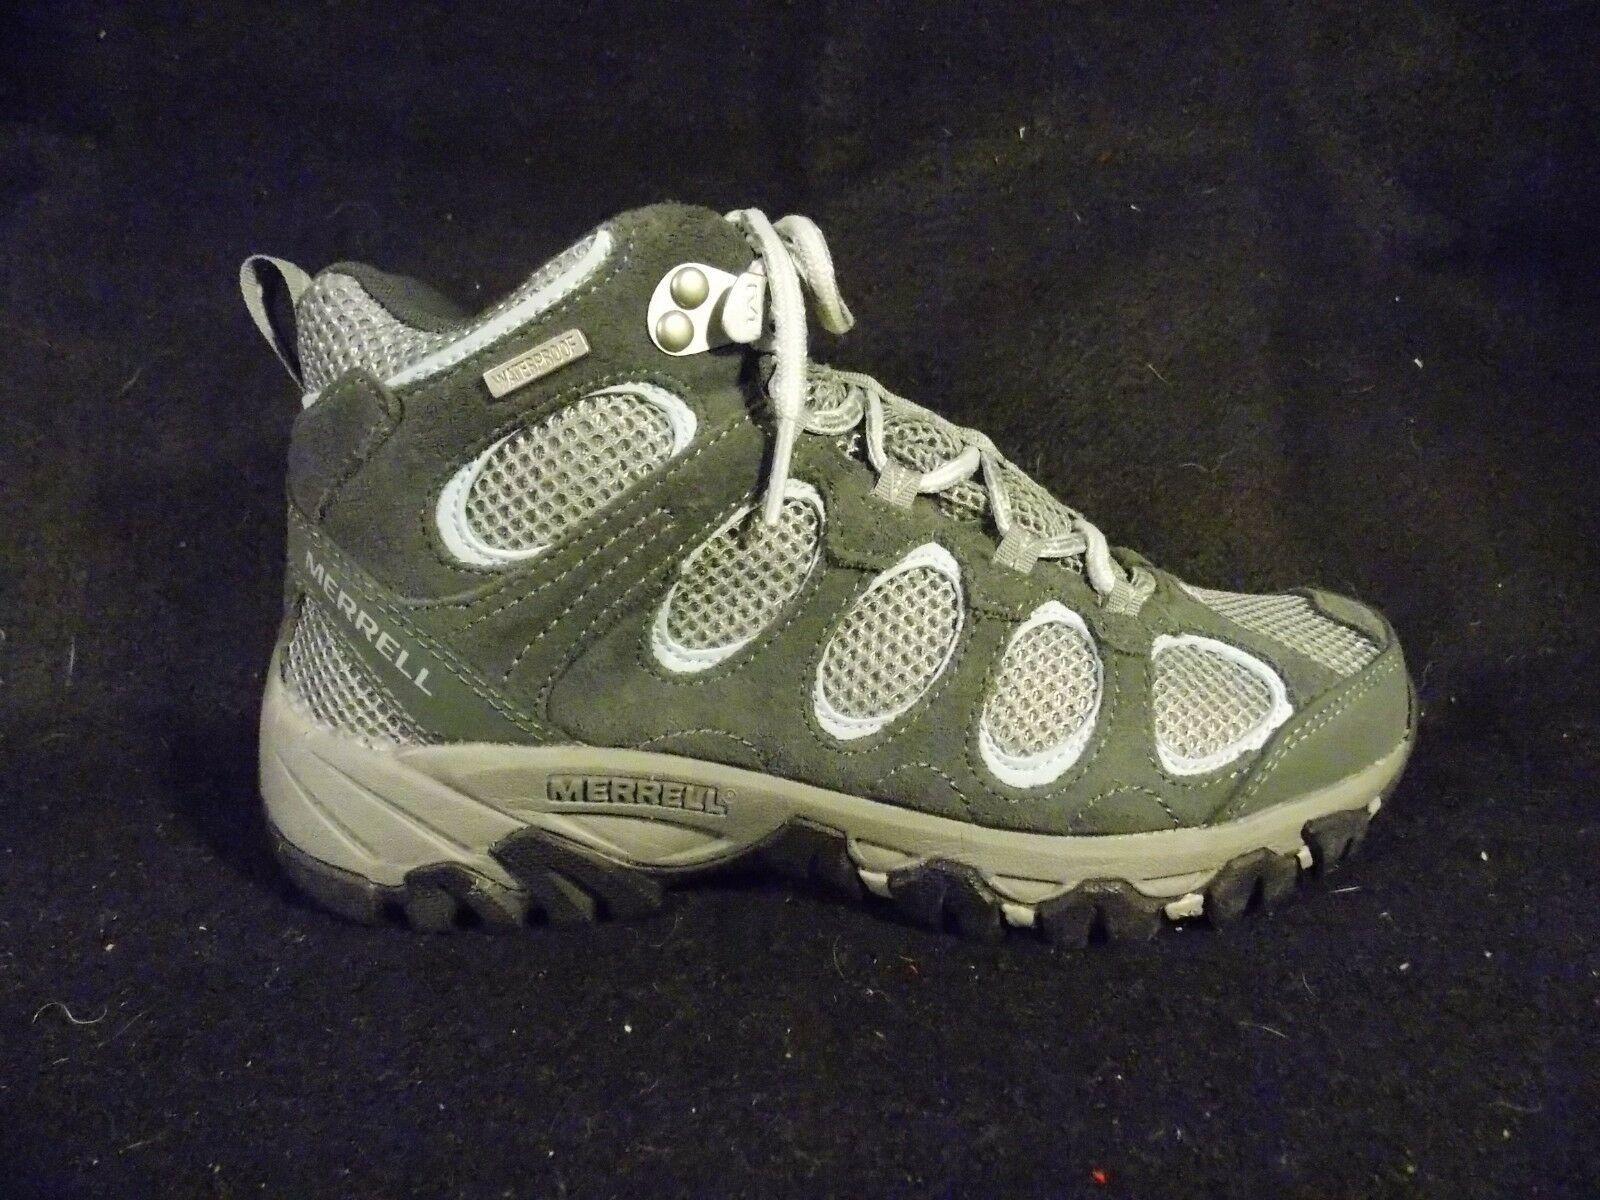 Women's Merrell Hilltop Vent Waterproof Castle Rock Gray Hiking Shoes Size 6 image 6